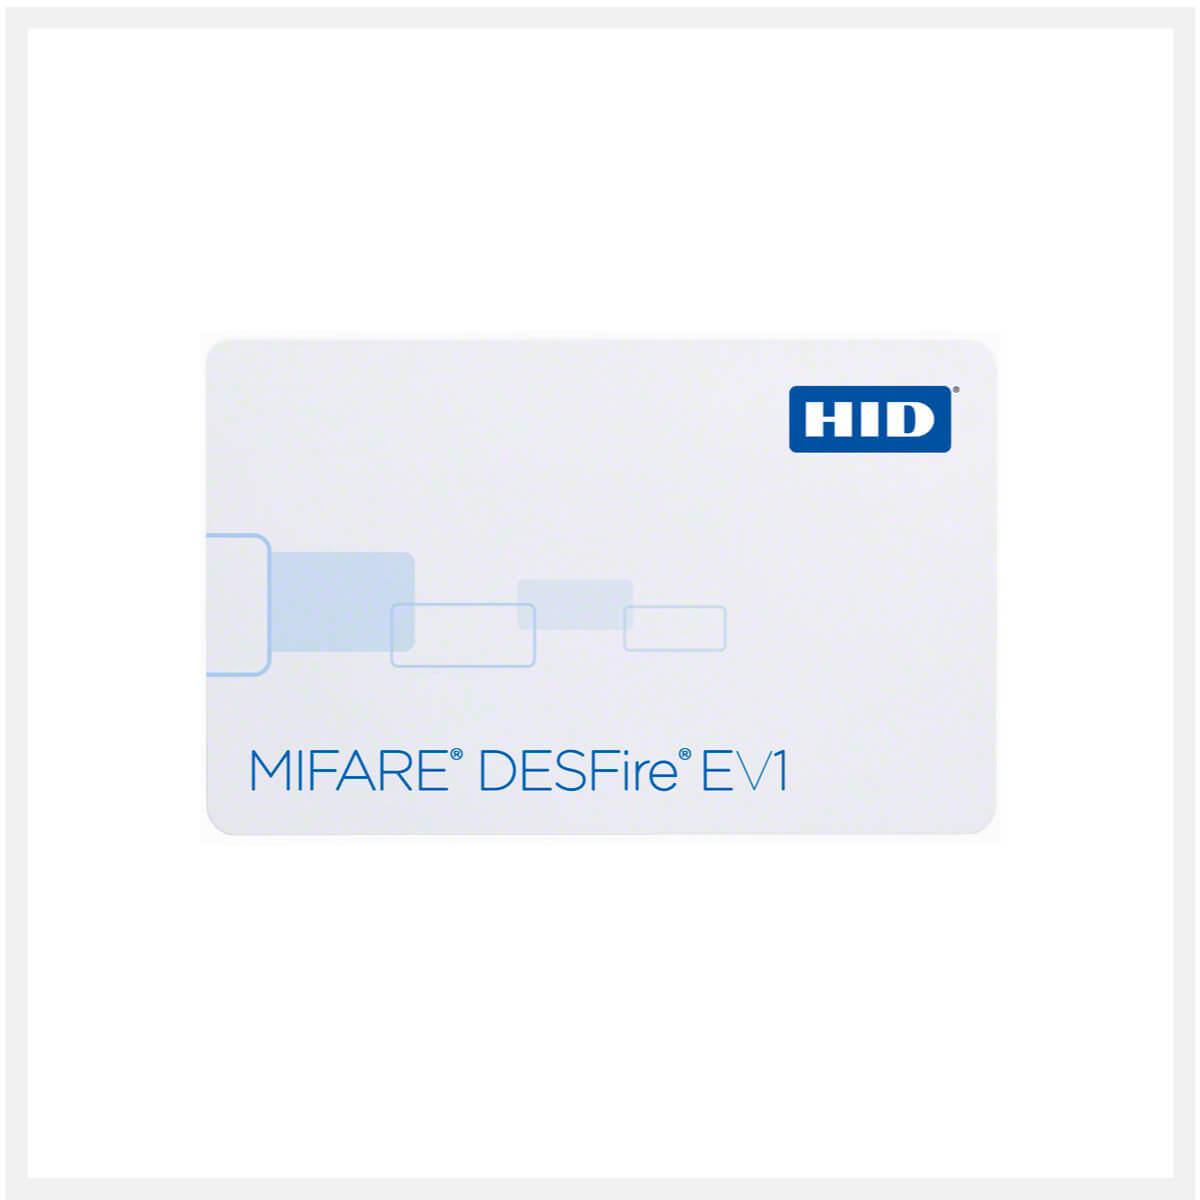 HID-FlexSmart-MIFARE-DESFire-EV1-1450-Card